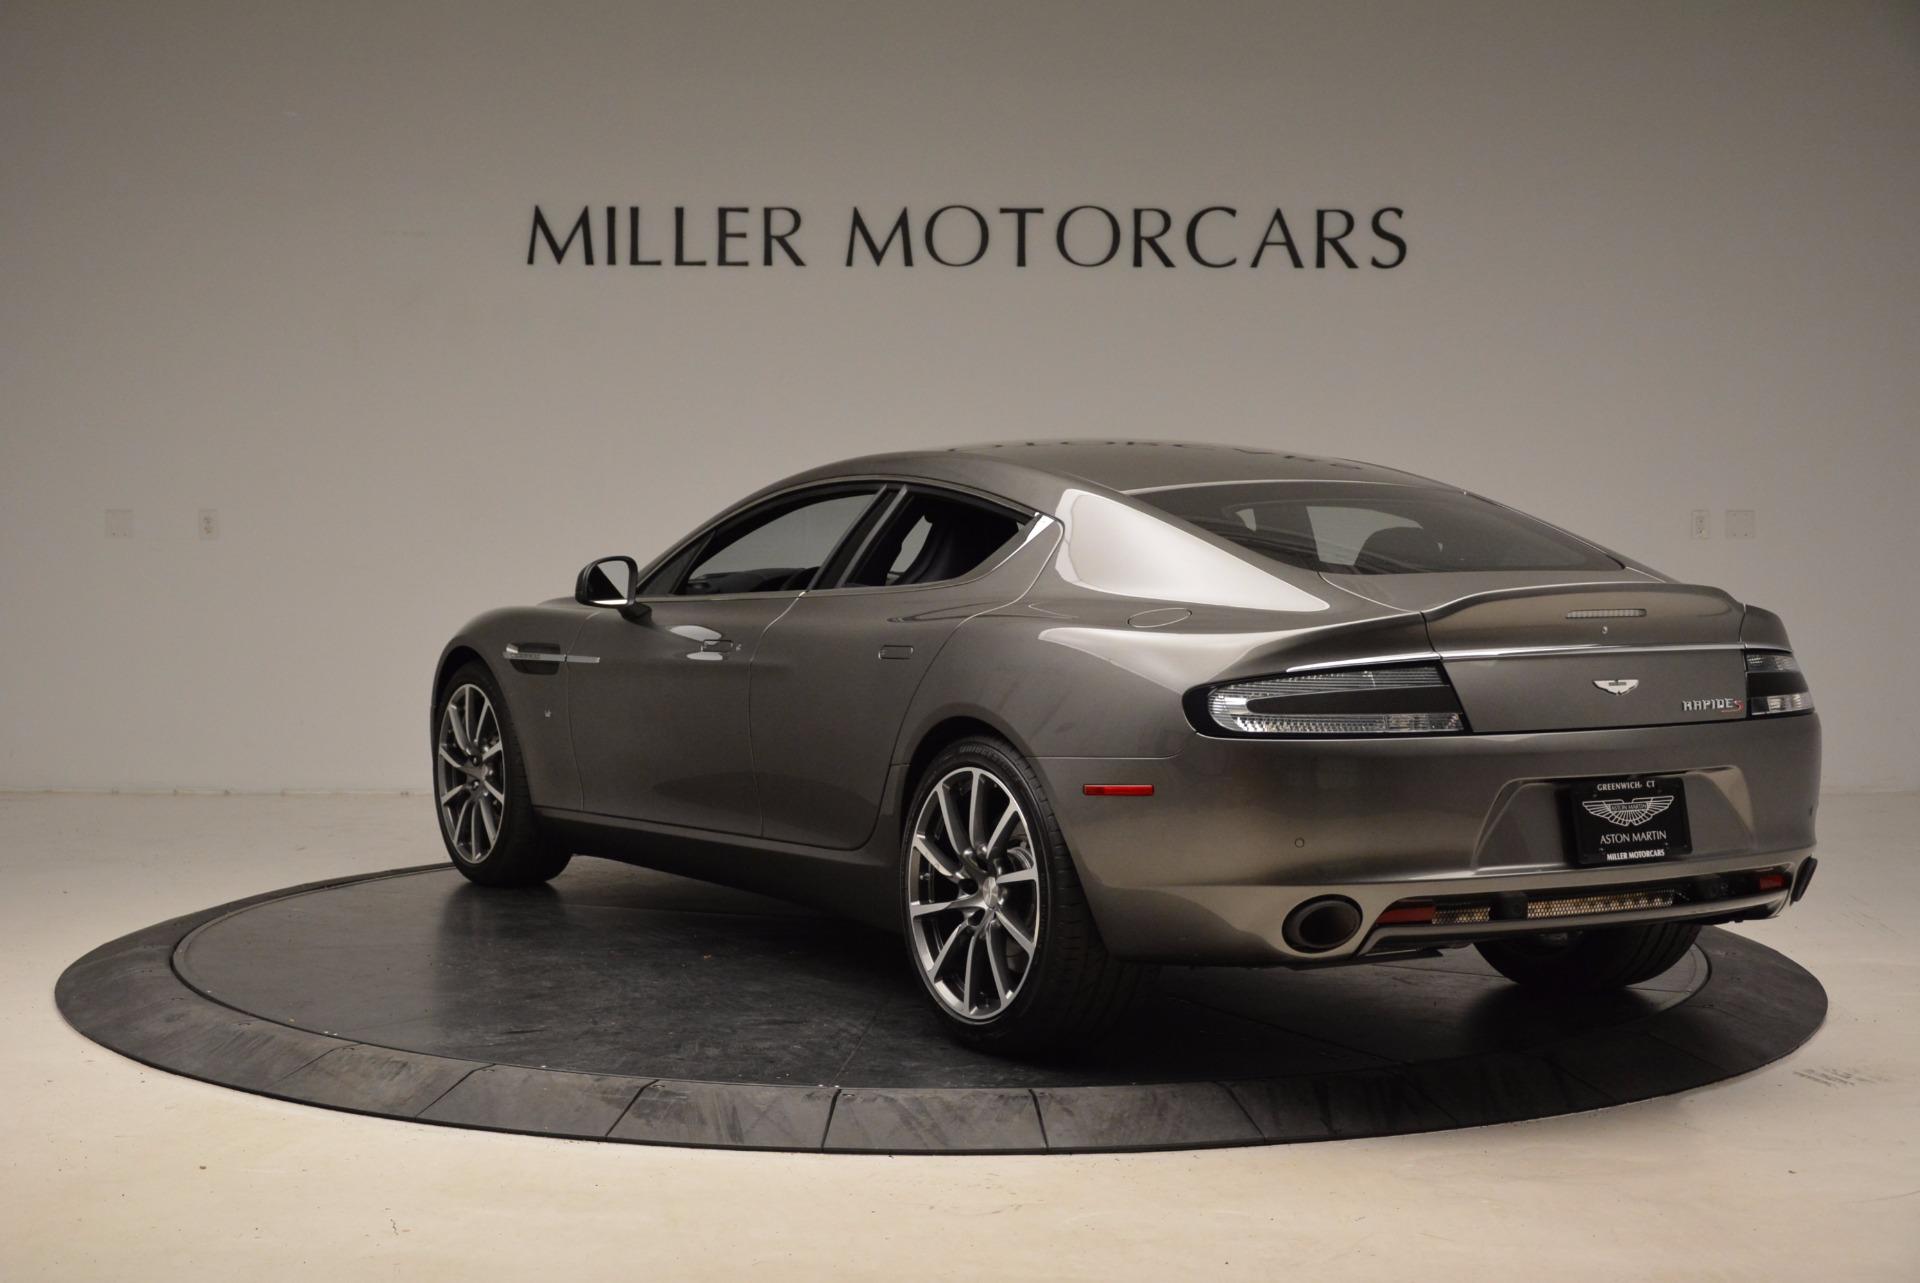 Used 2017 Aston Martin Rapide S Sedan For Sale In Greenwich, CT 1843_p5